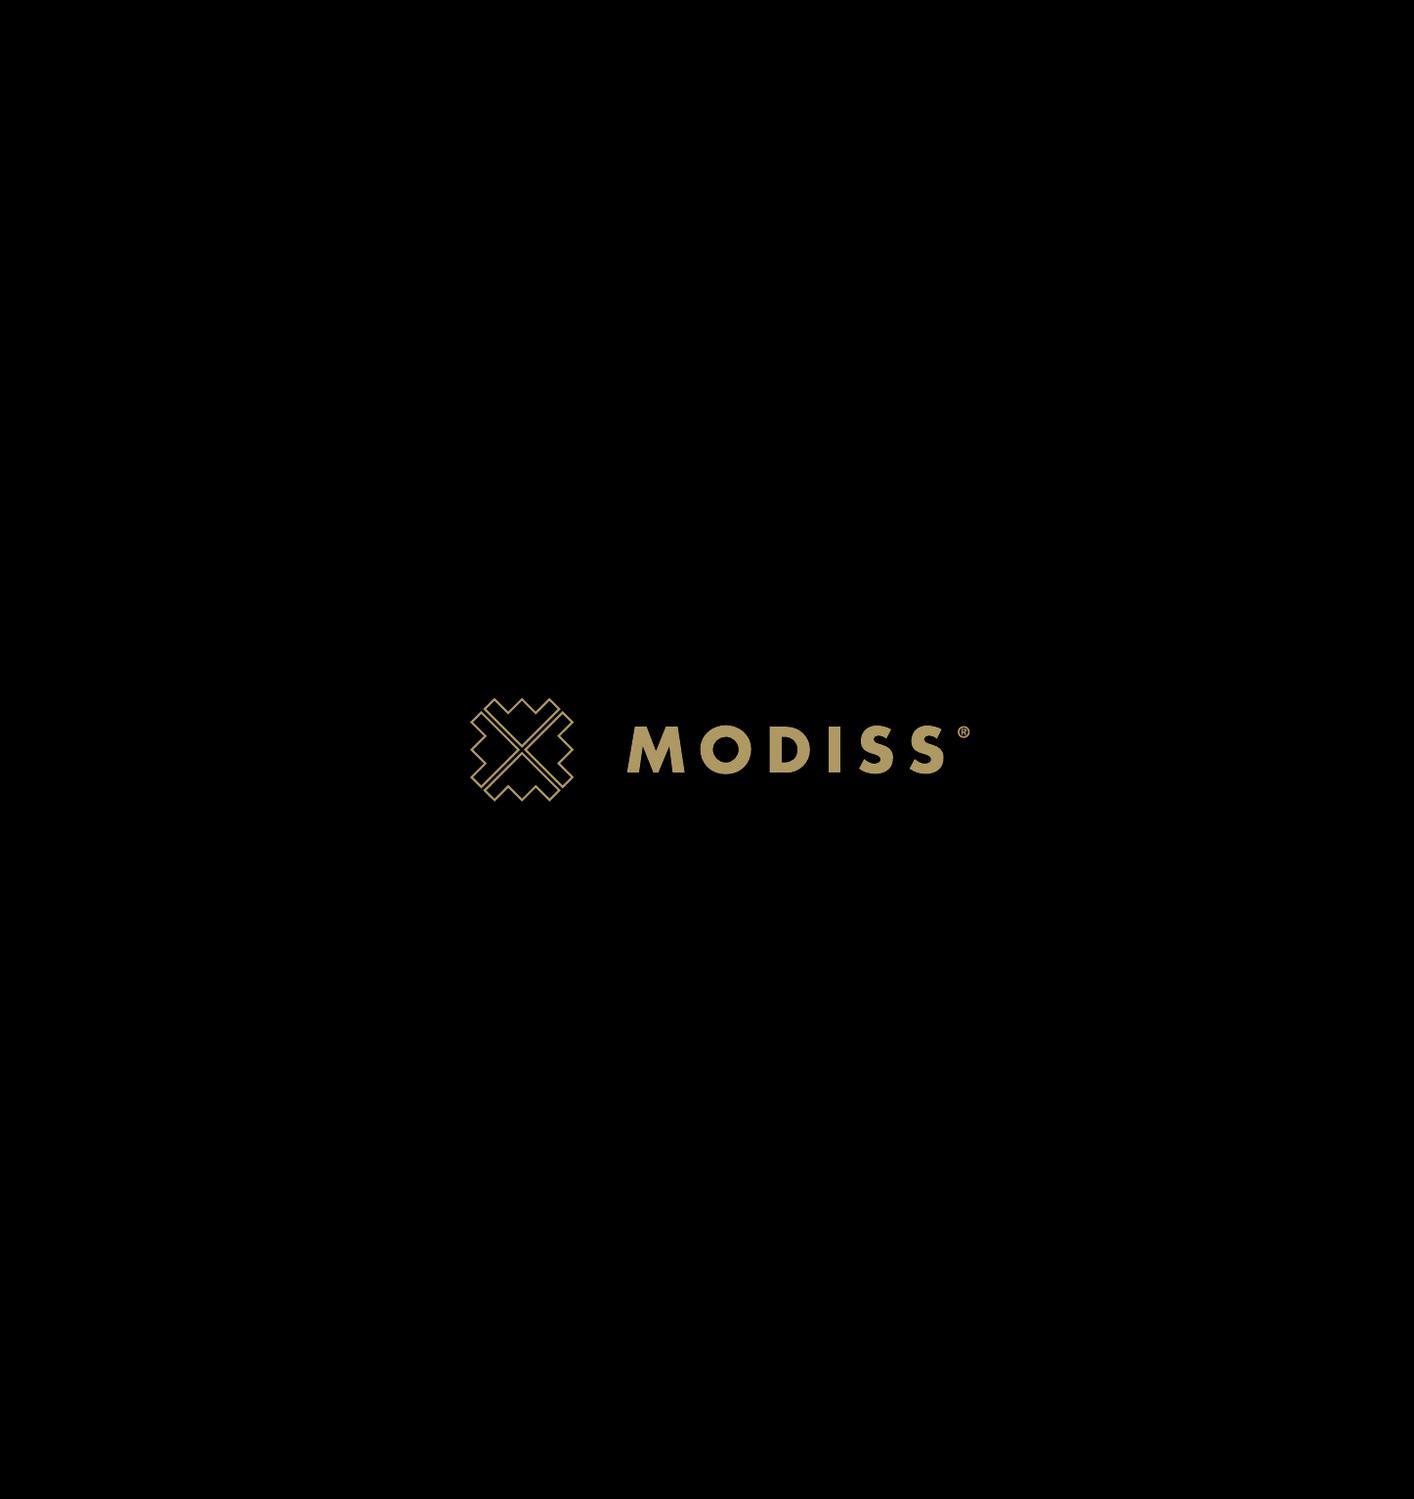 Cat logo modiss by mercedes arroyo issuu - Modiss iluminacion ...